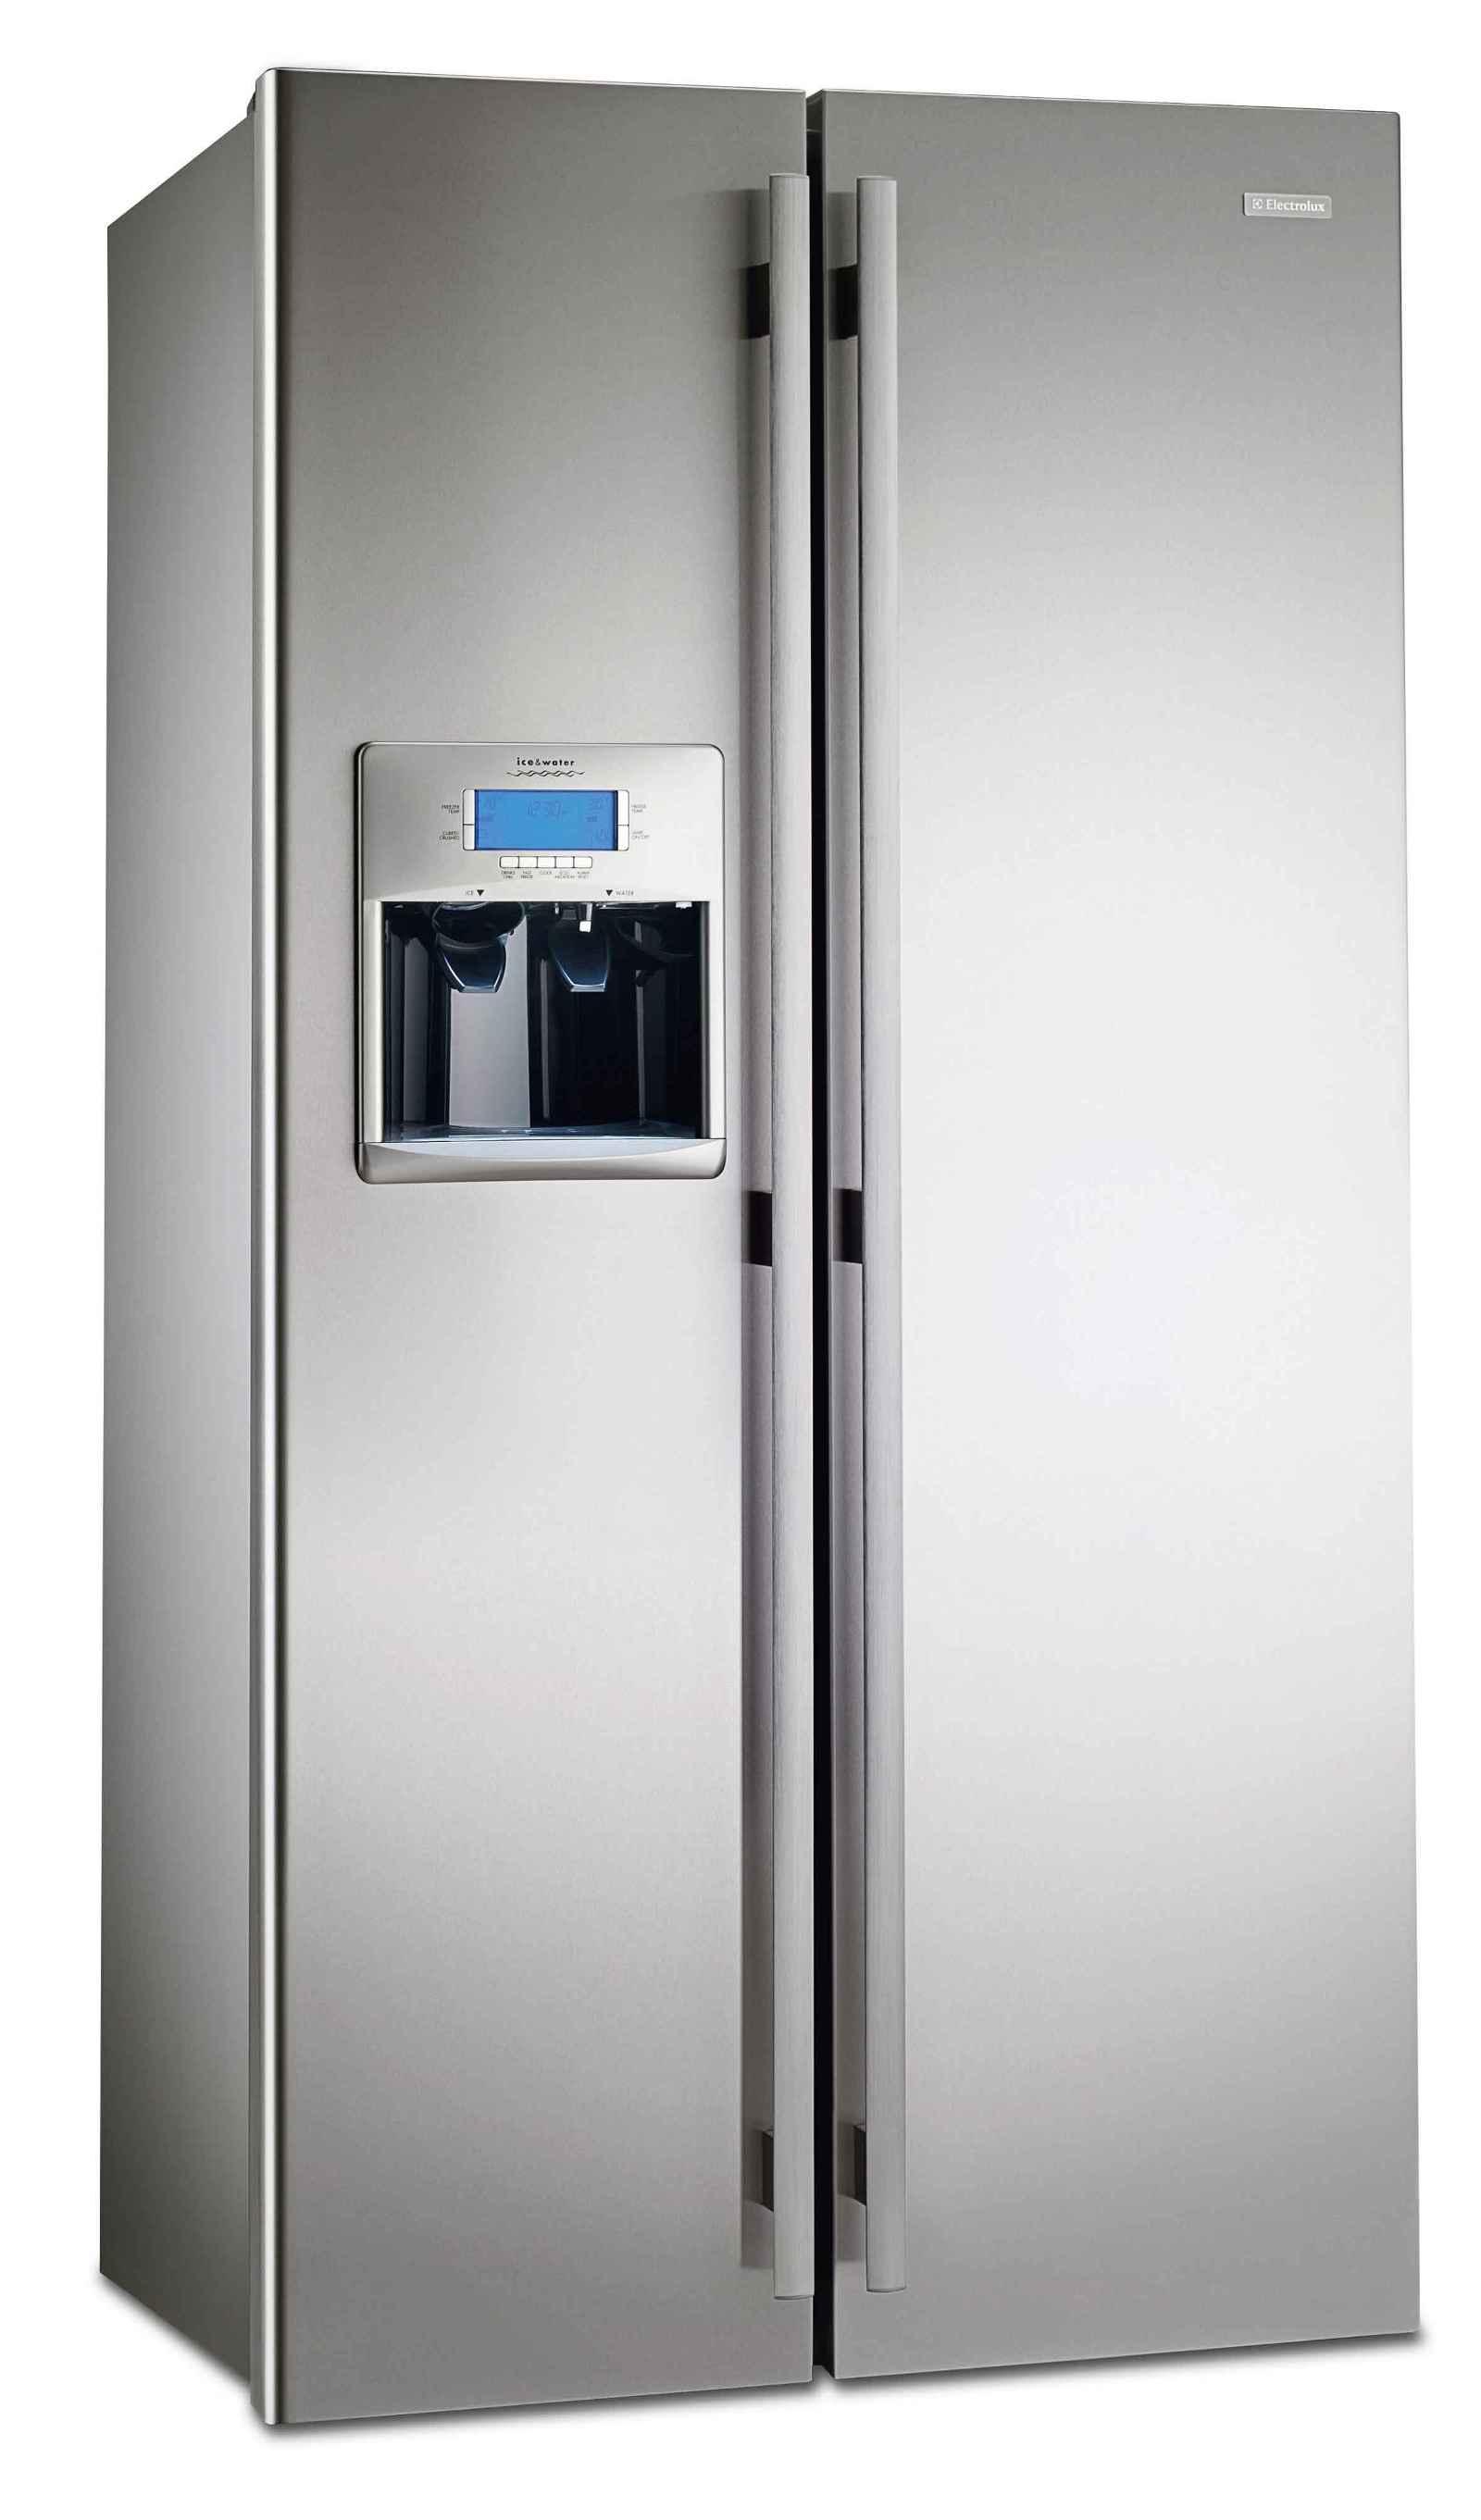 Refrigerator White Background Images AWB 1600x2723